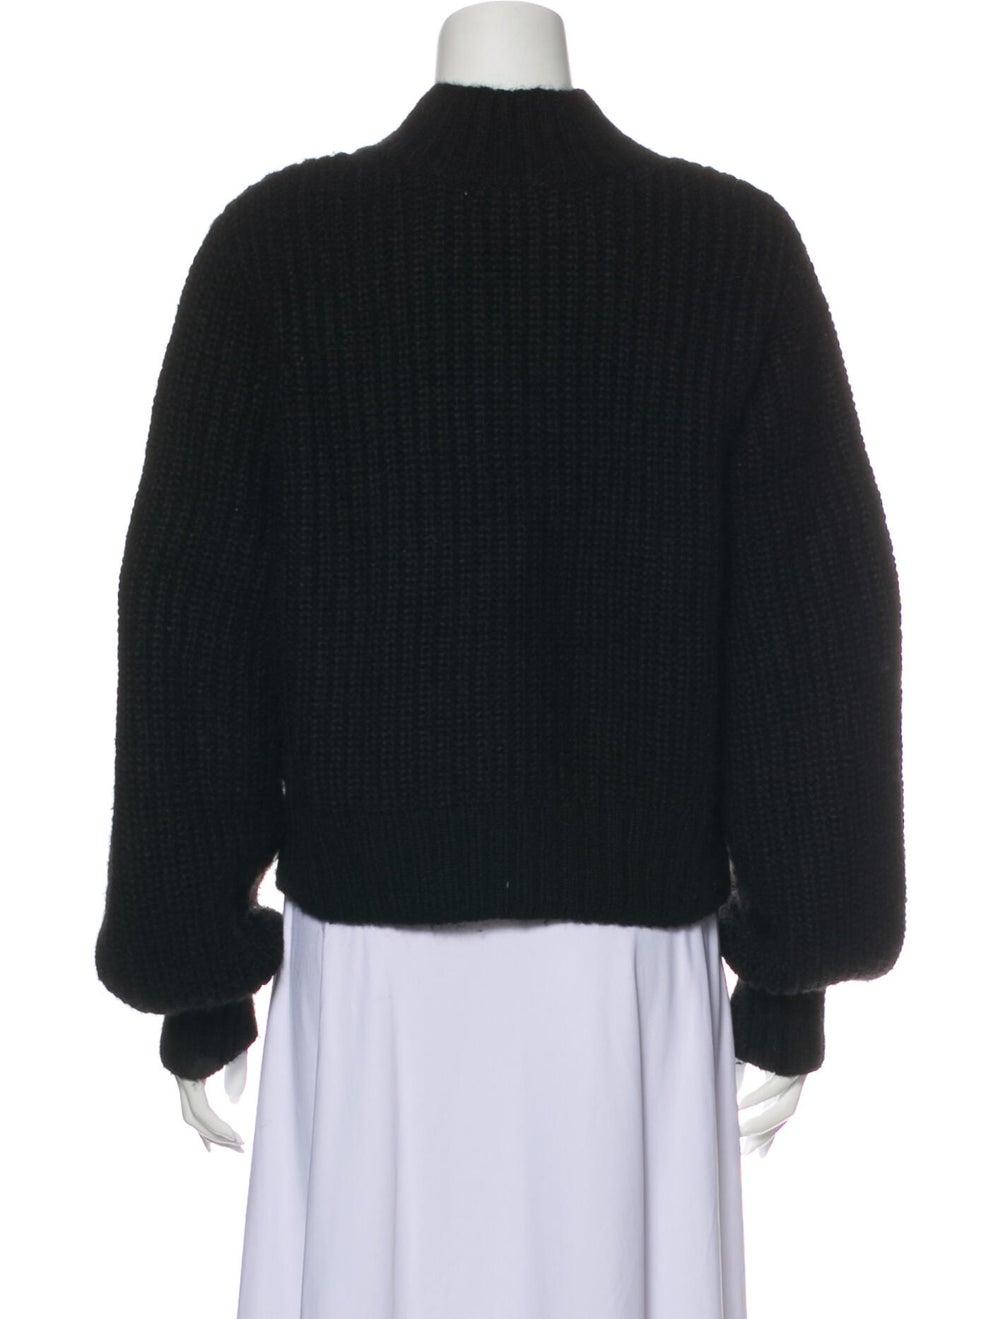 Dôen Mock Neck Sweater Black - image 3